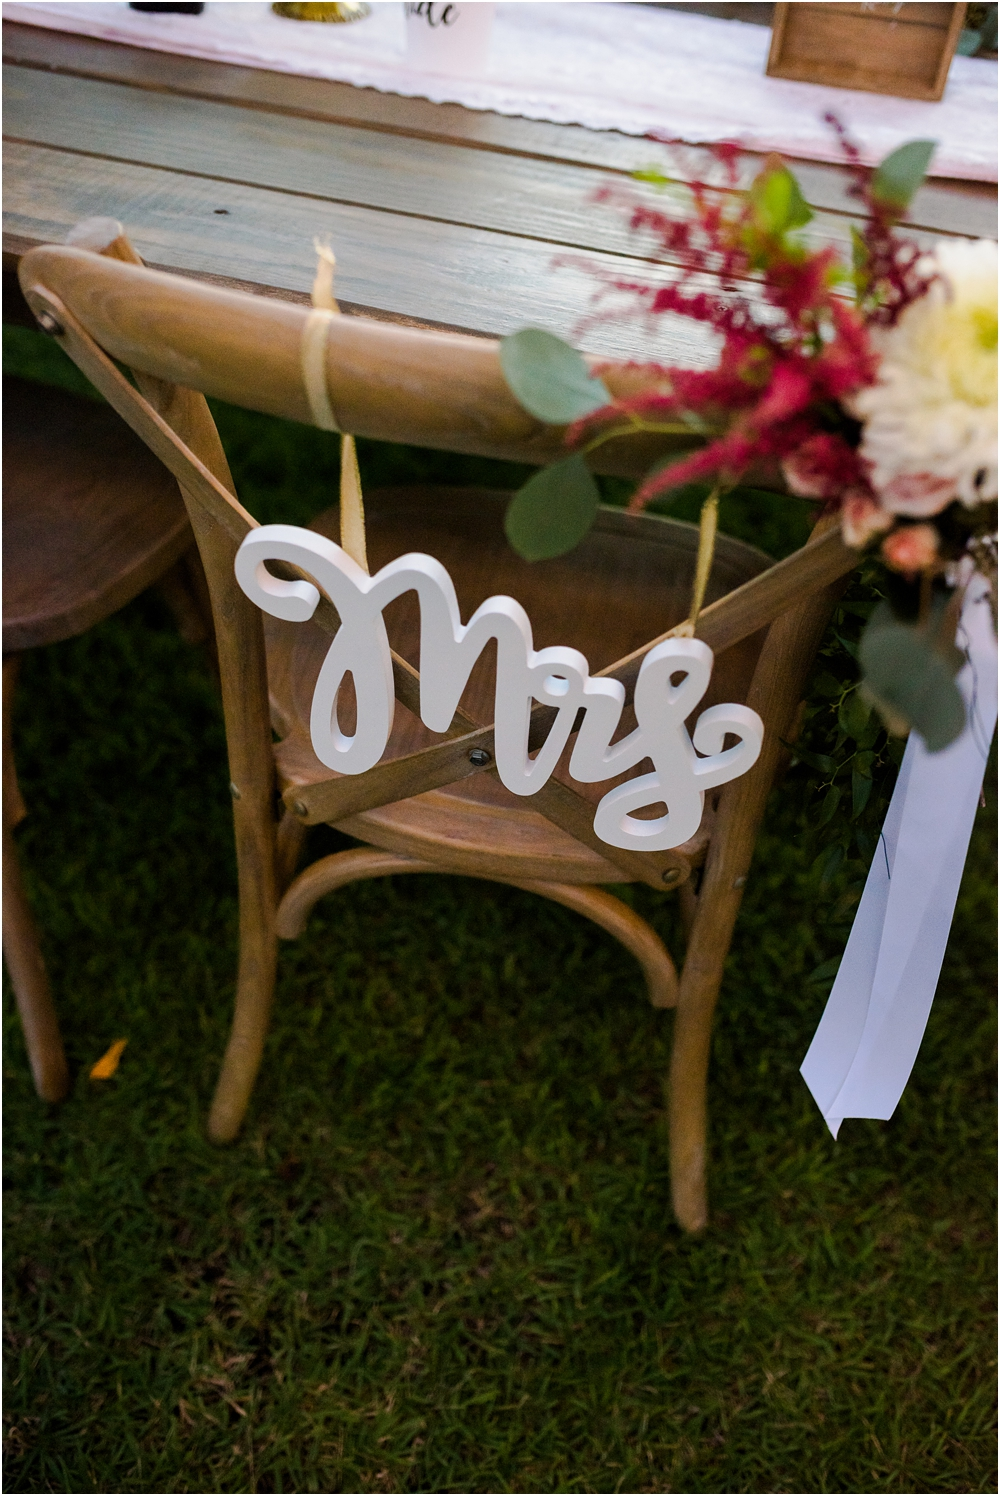 mcglothlin-wedding-kiersten-stevenson-photography-30a-panama-city-beach-dothan-tallahassee-(122-of-145).jpg